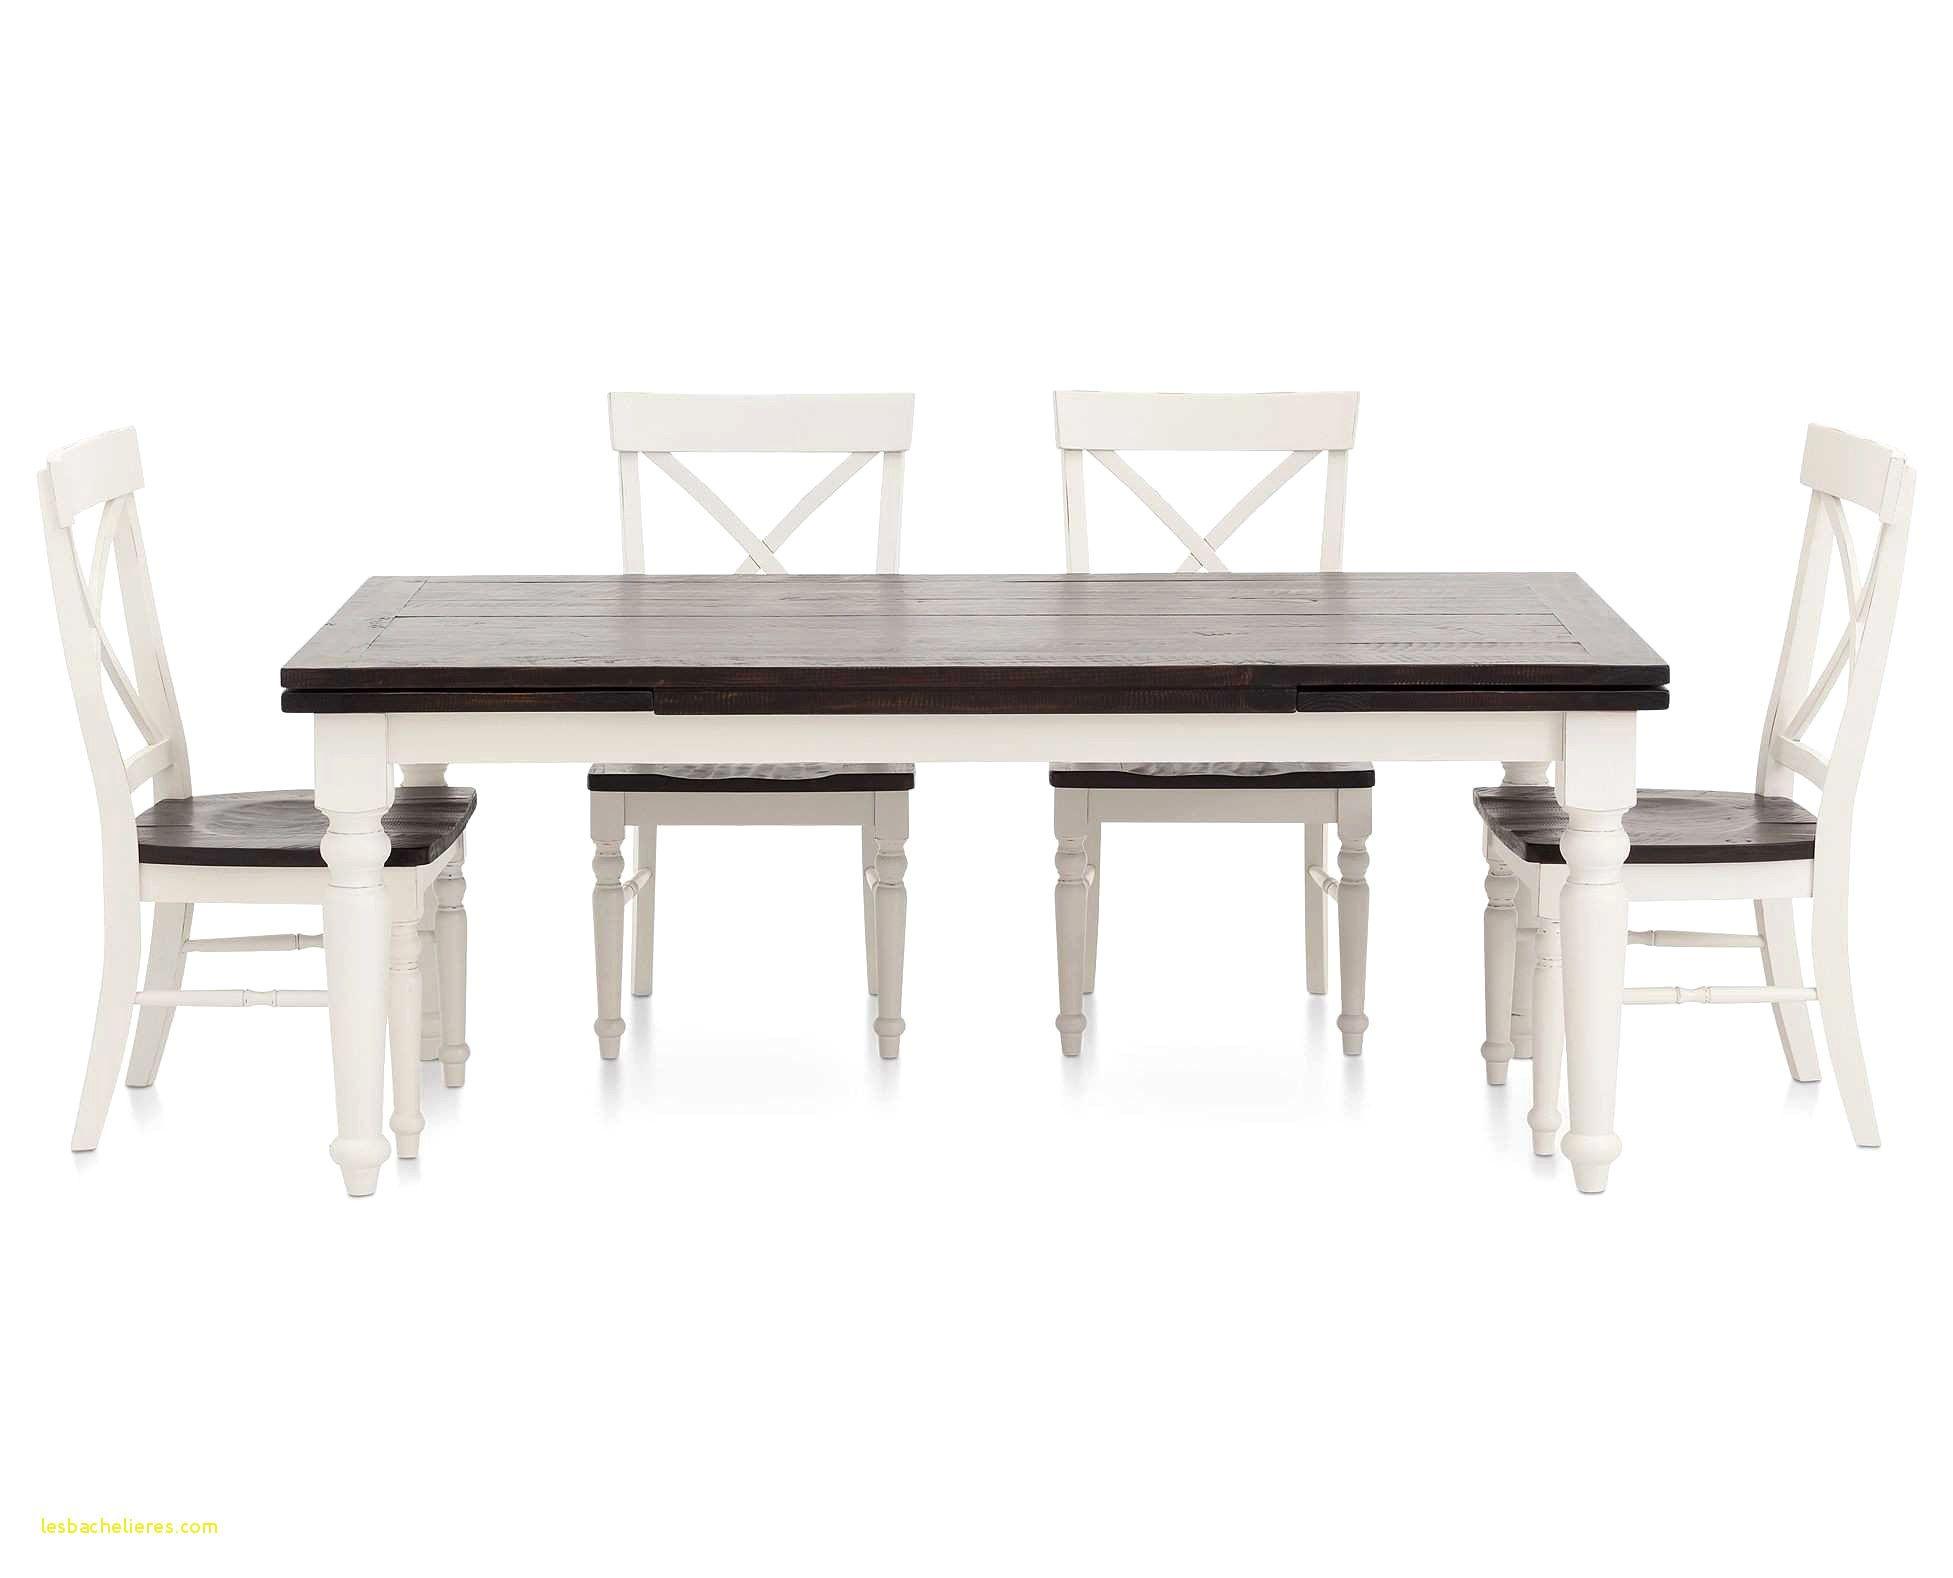 30 Meilleur Chaise Moderne Avec Table Ancienne Idees Inspirantes